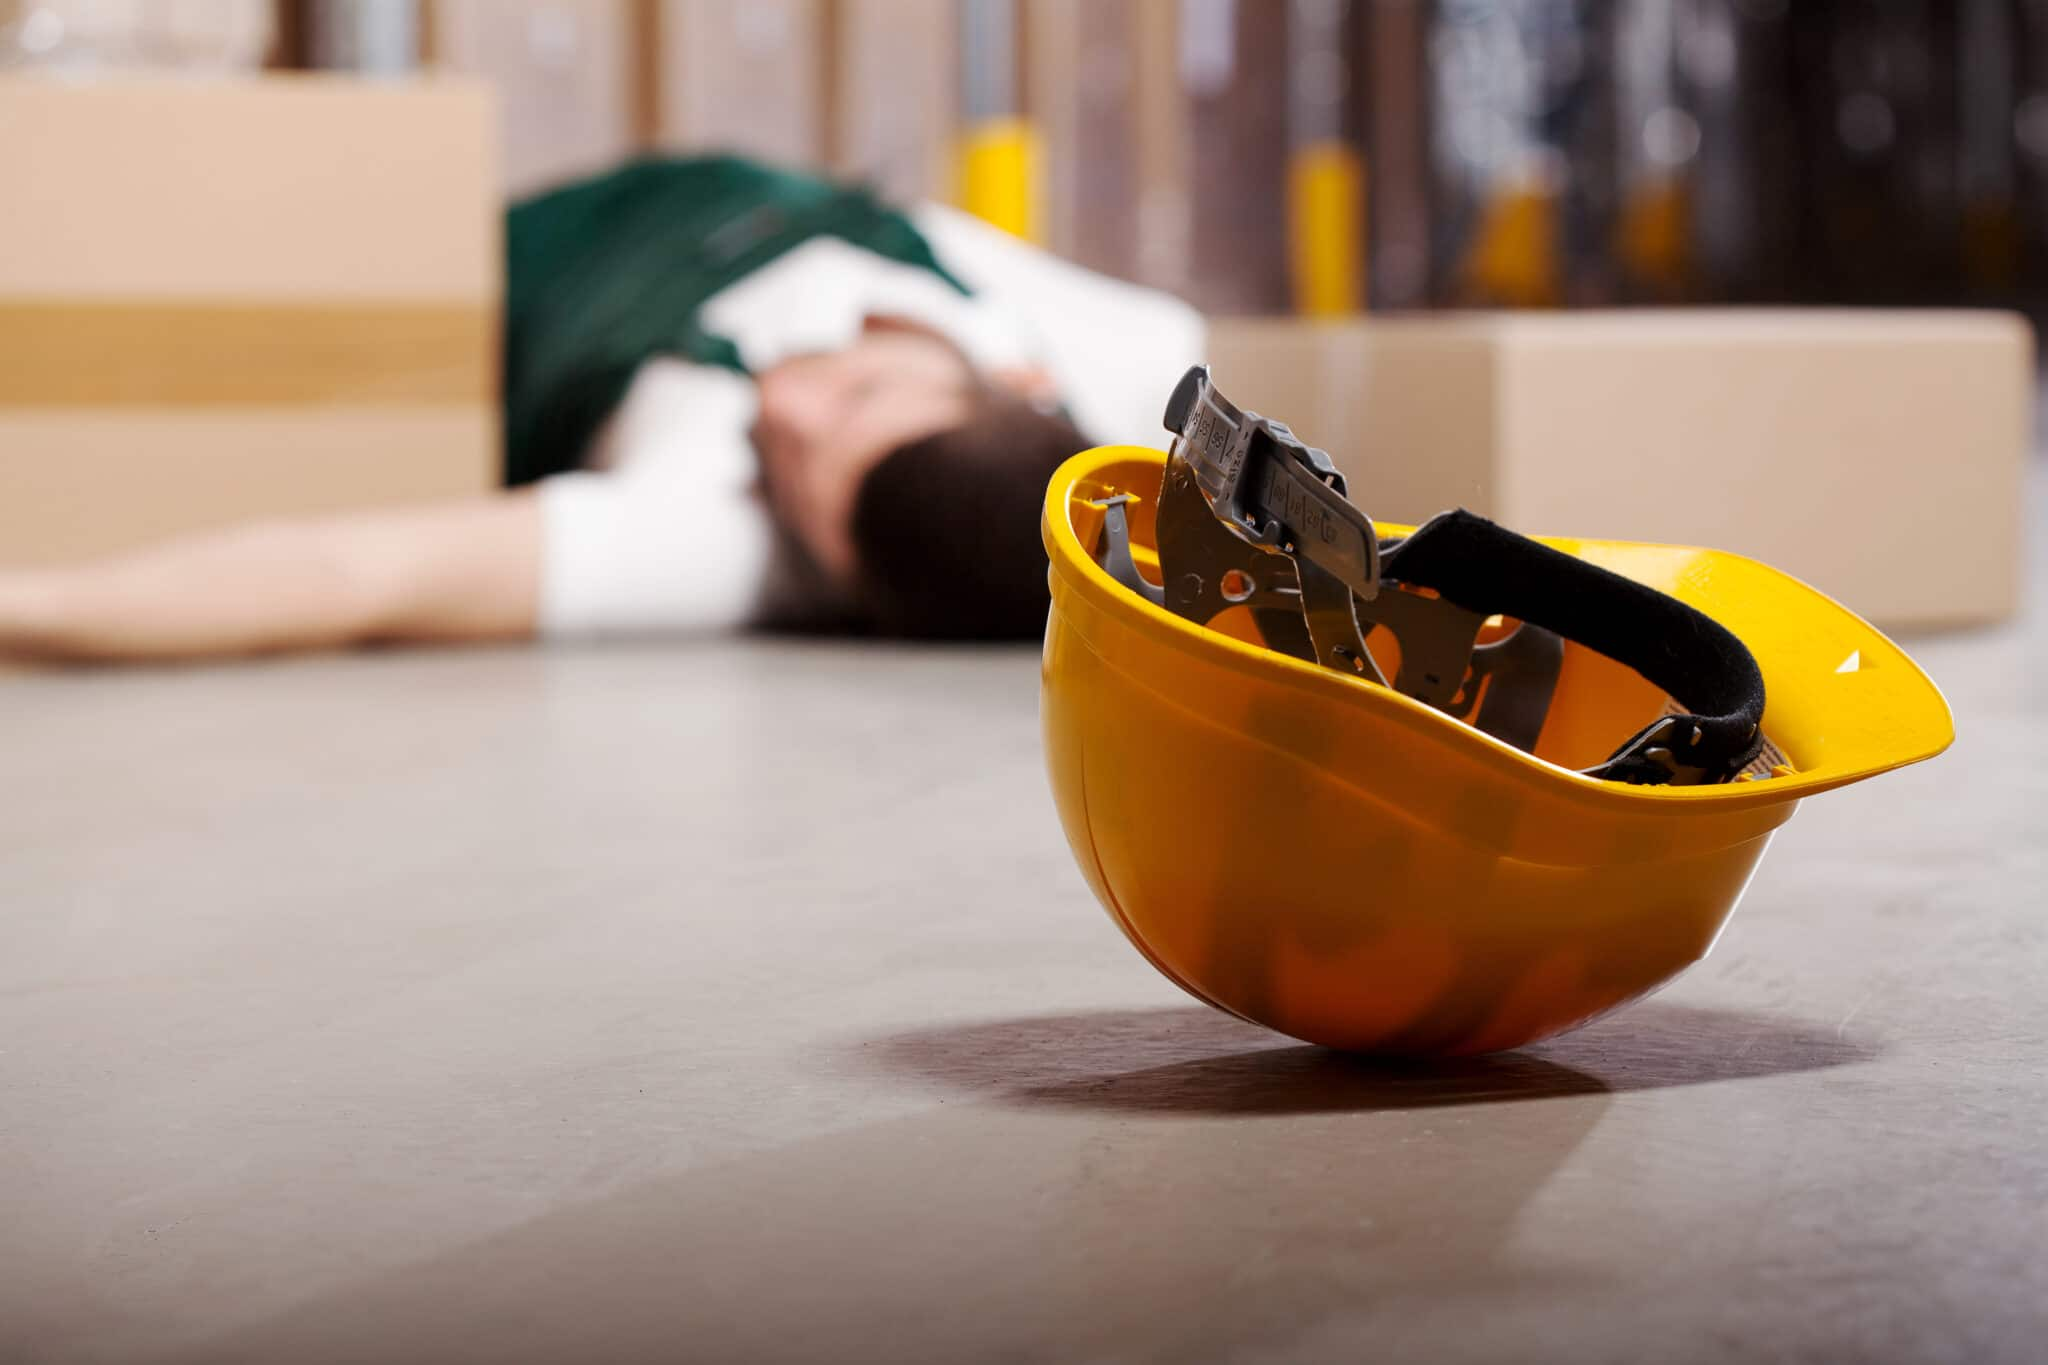 hard hat on ground with blurry injured worker in background